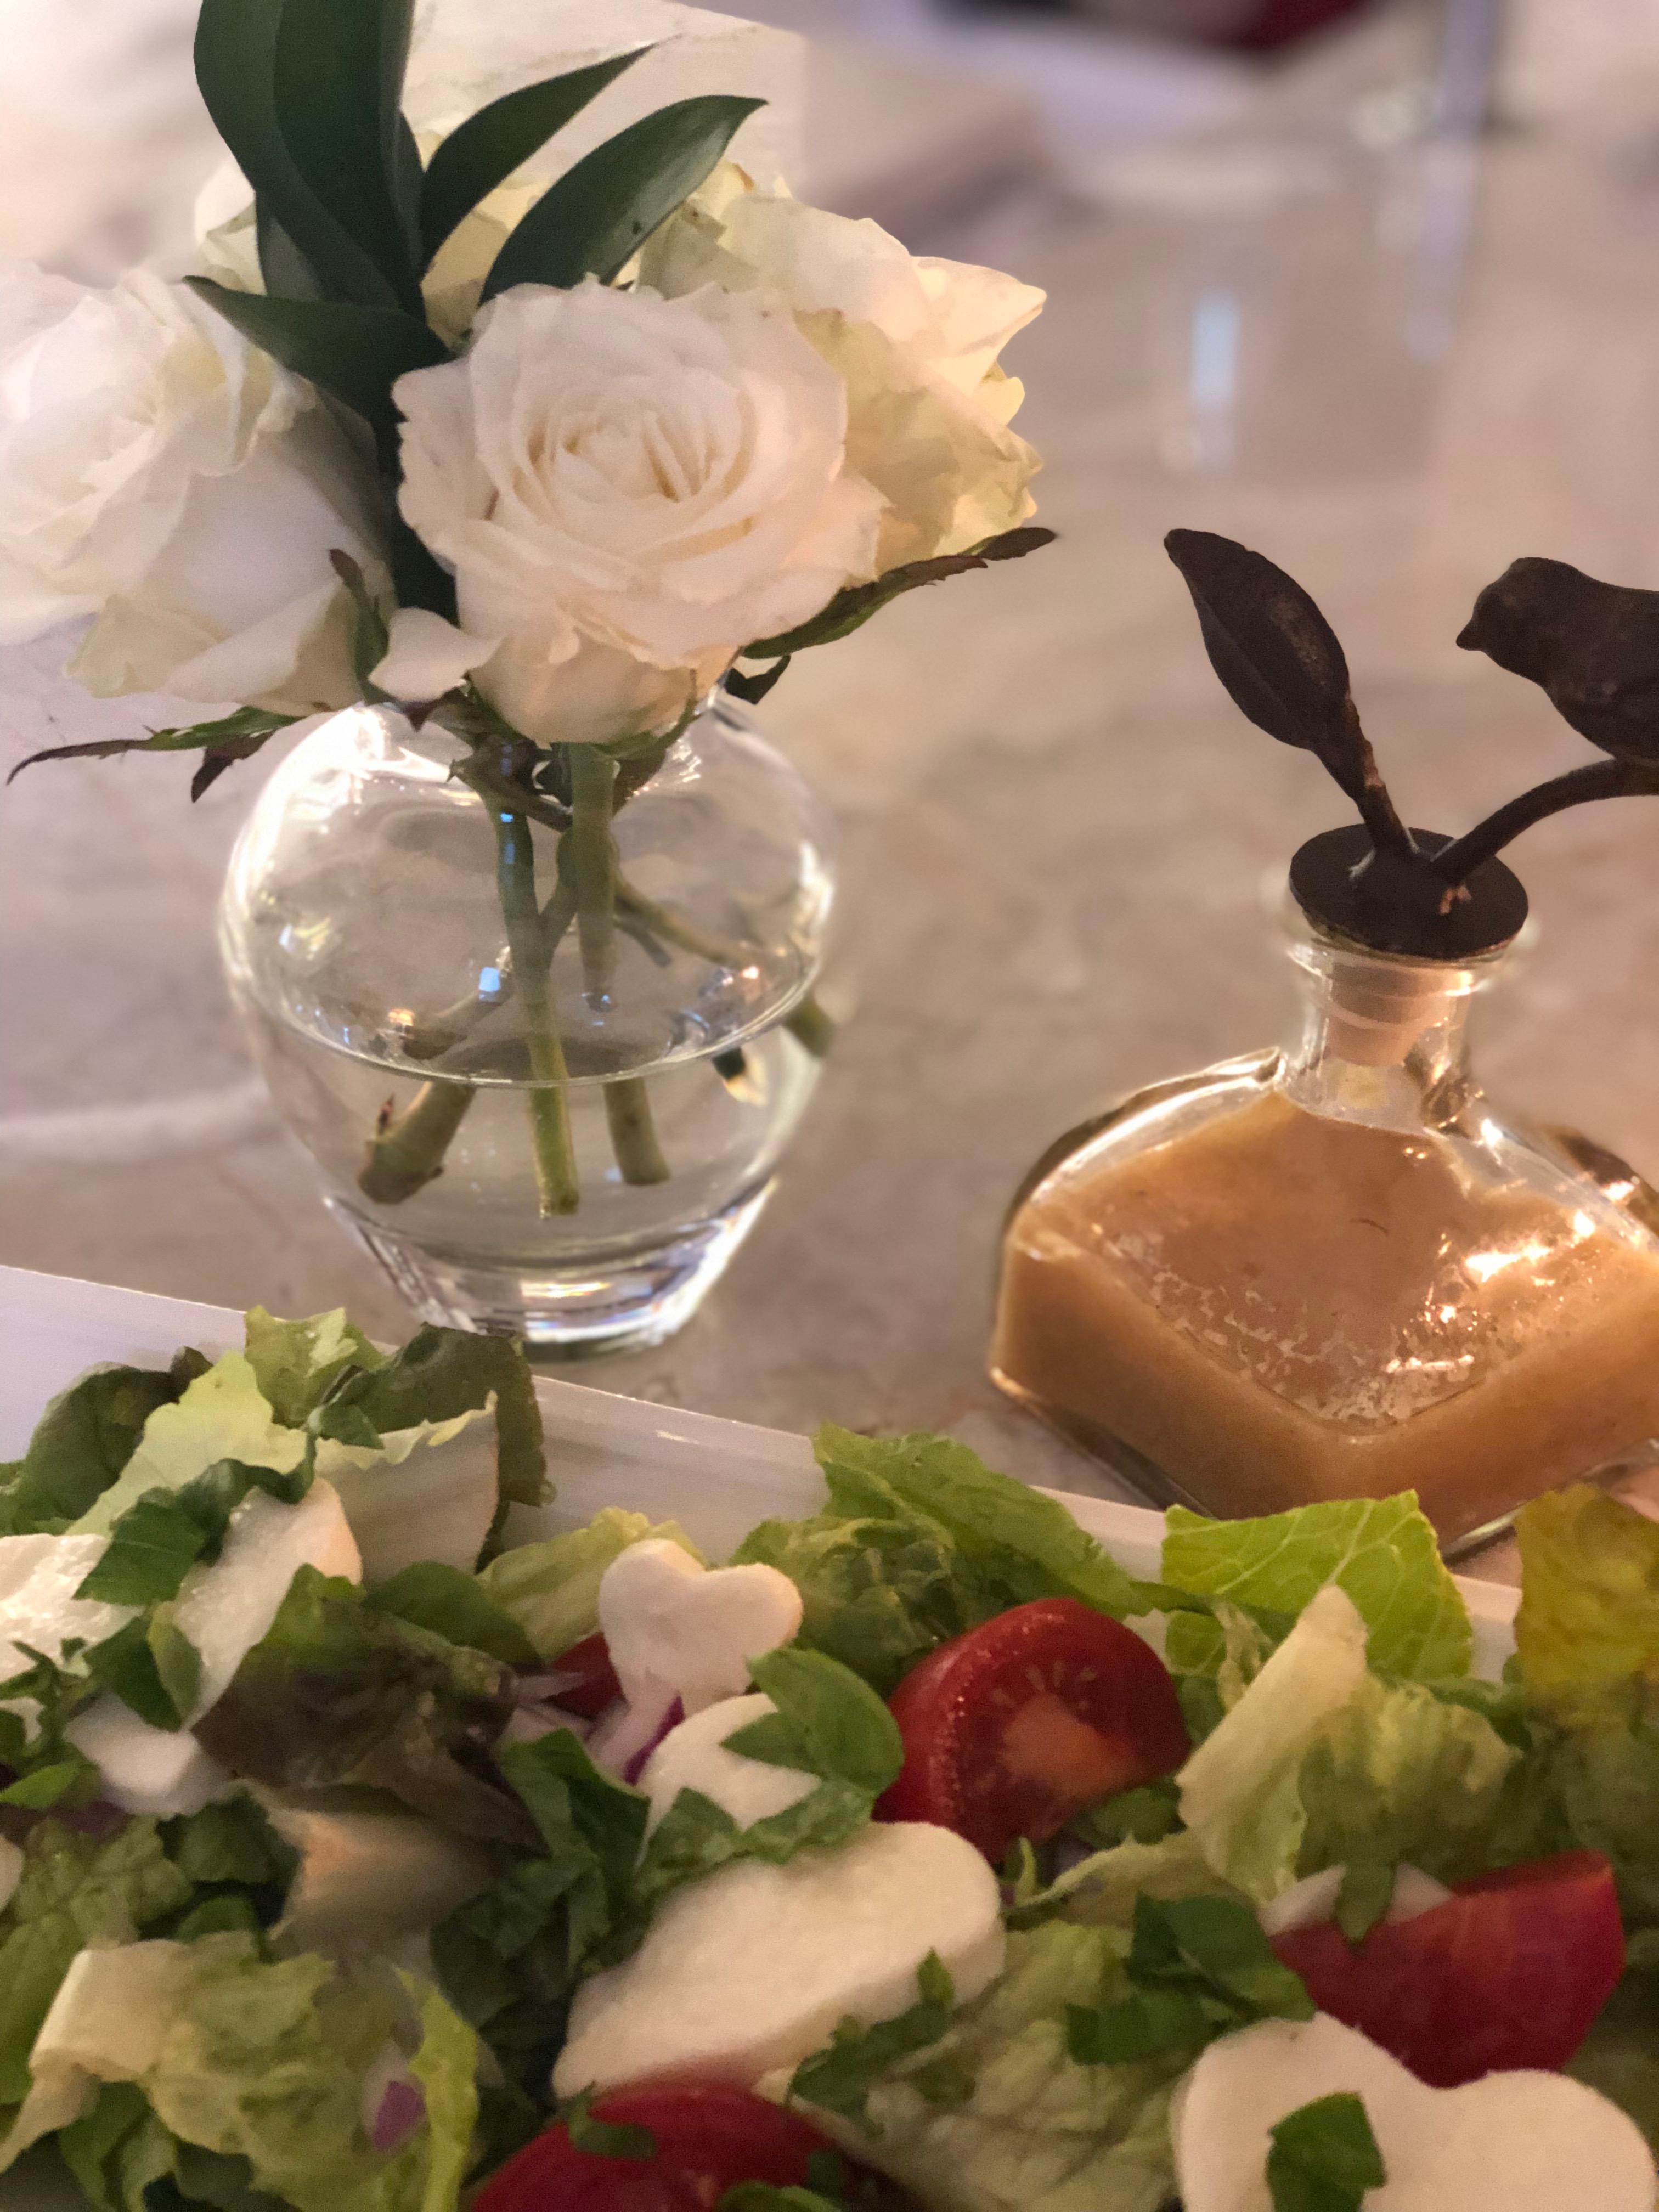 Green salad with heart shaped mozzarella, cherry tomatoes, fresh basil and homemade vinaigrette